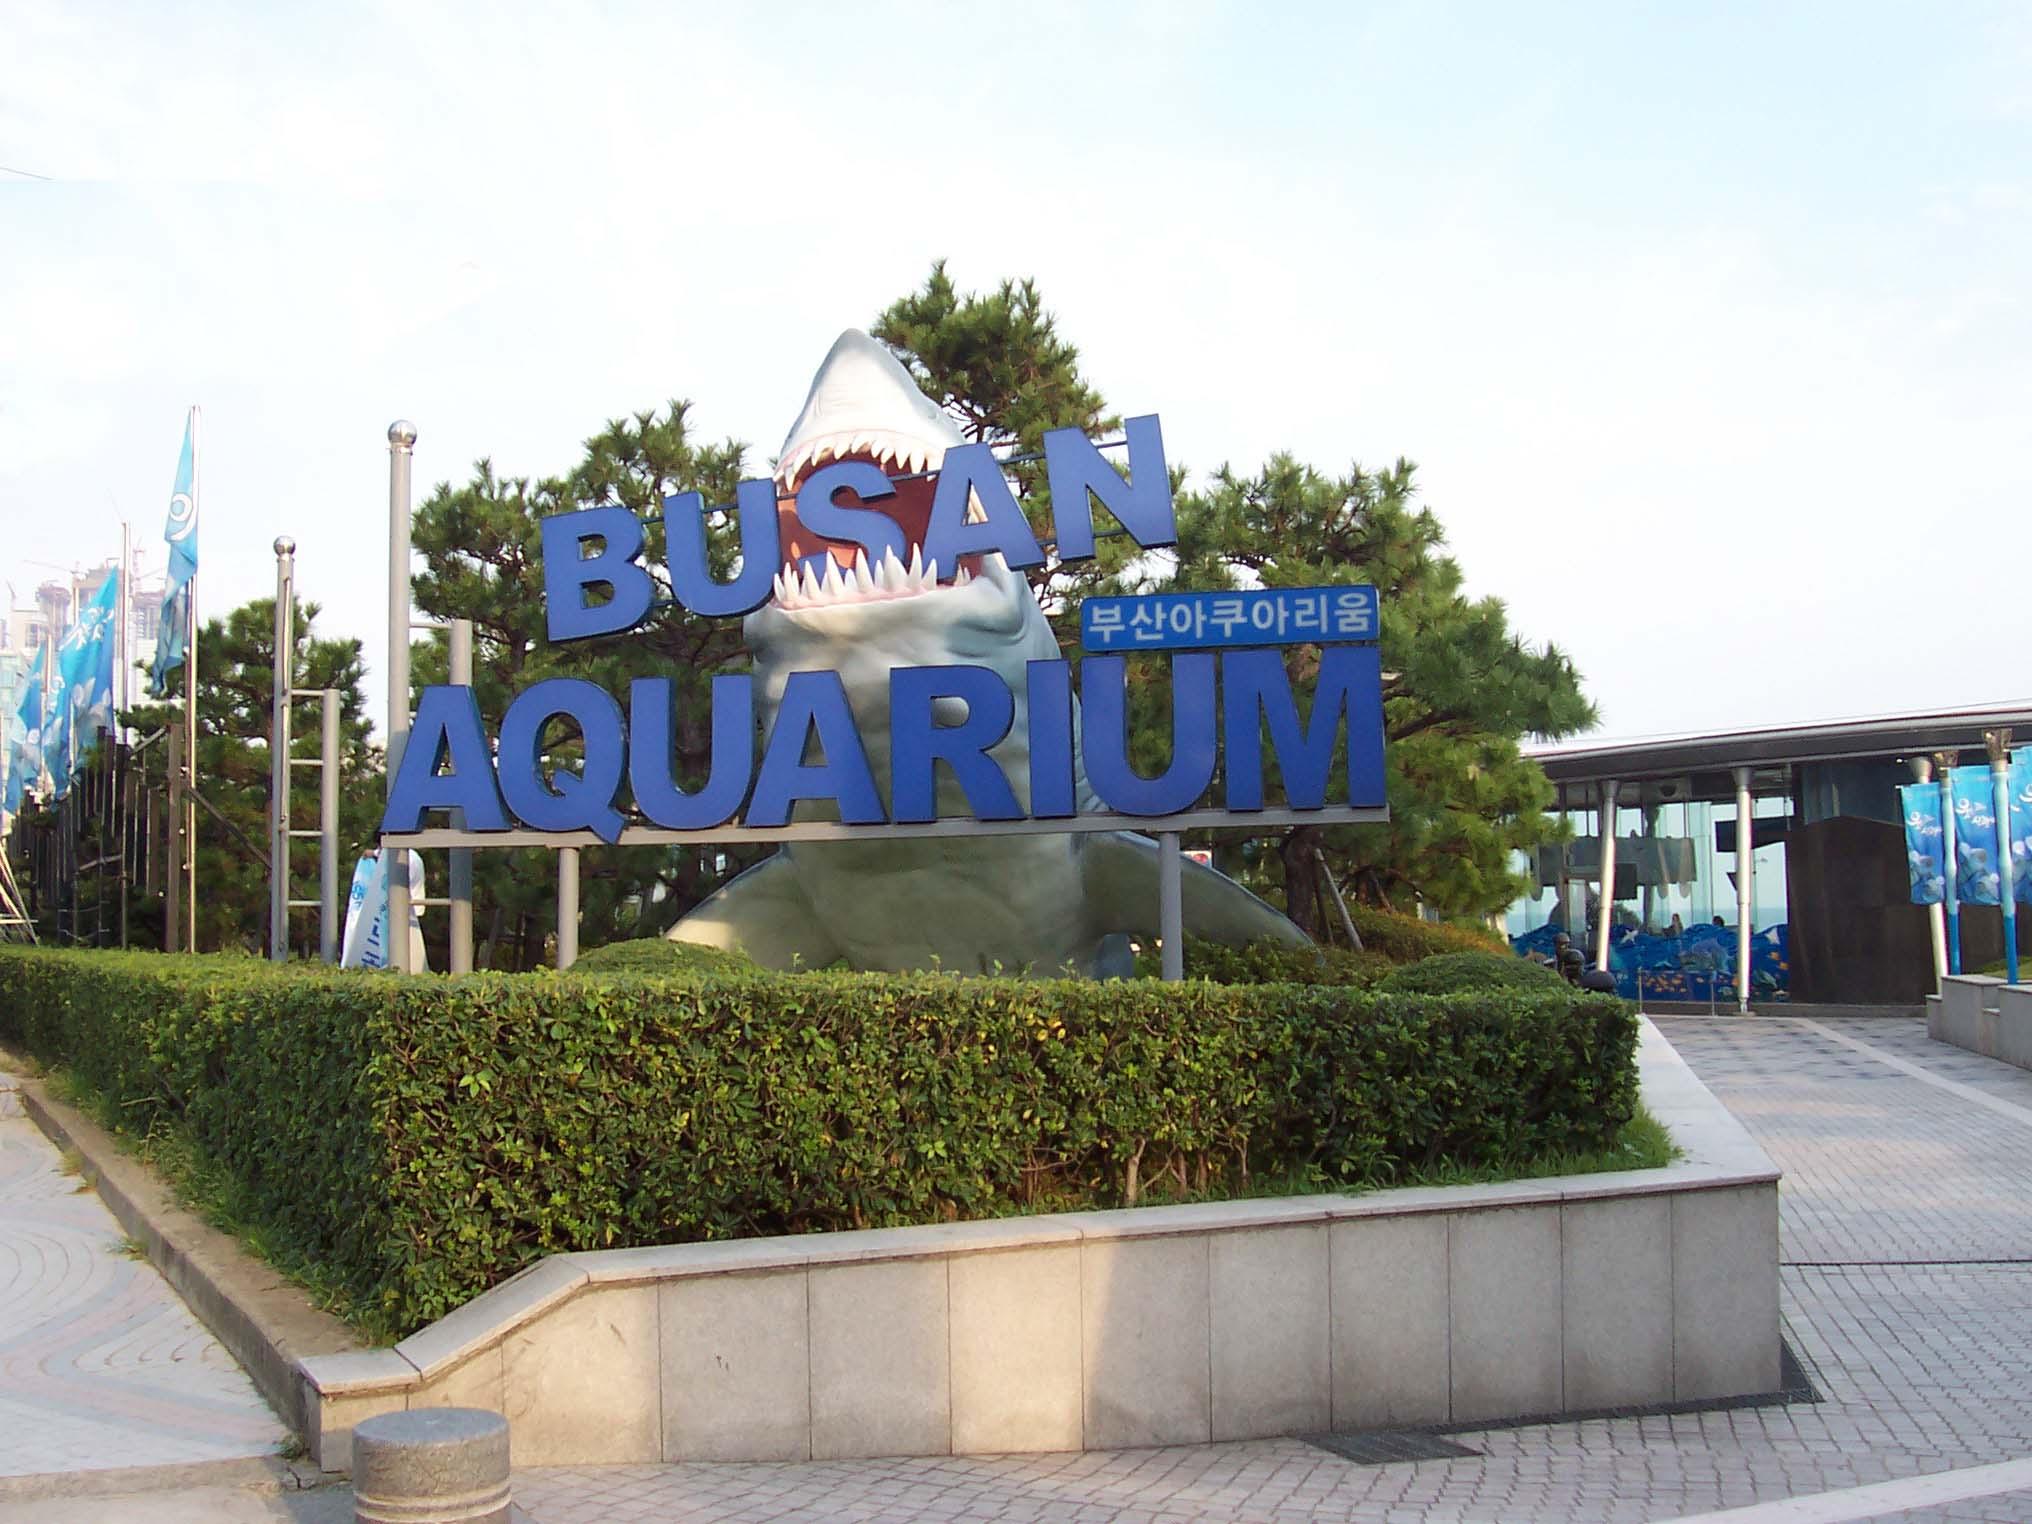 File:Busan Aquarium.jpg - Wikimedia Commons